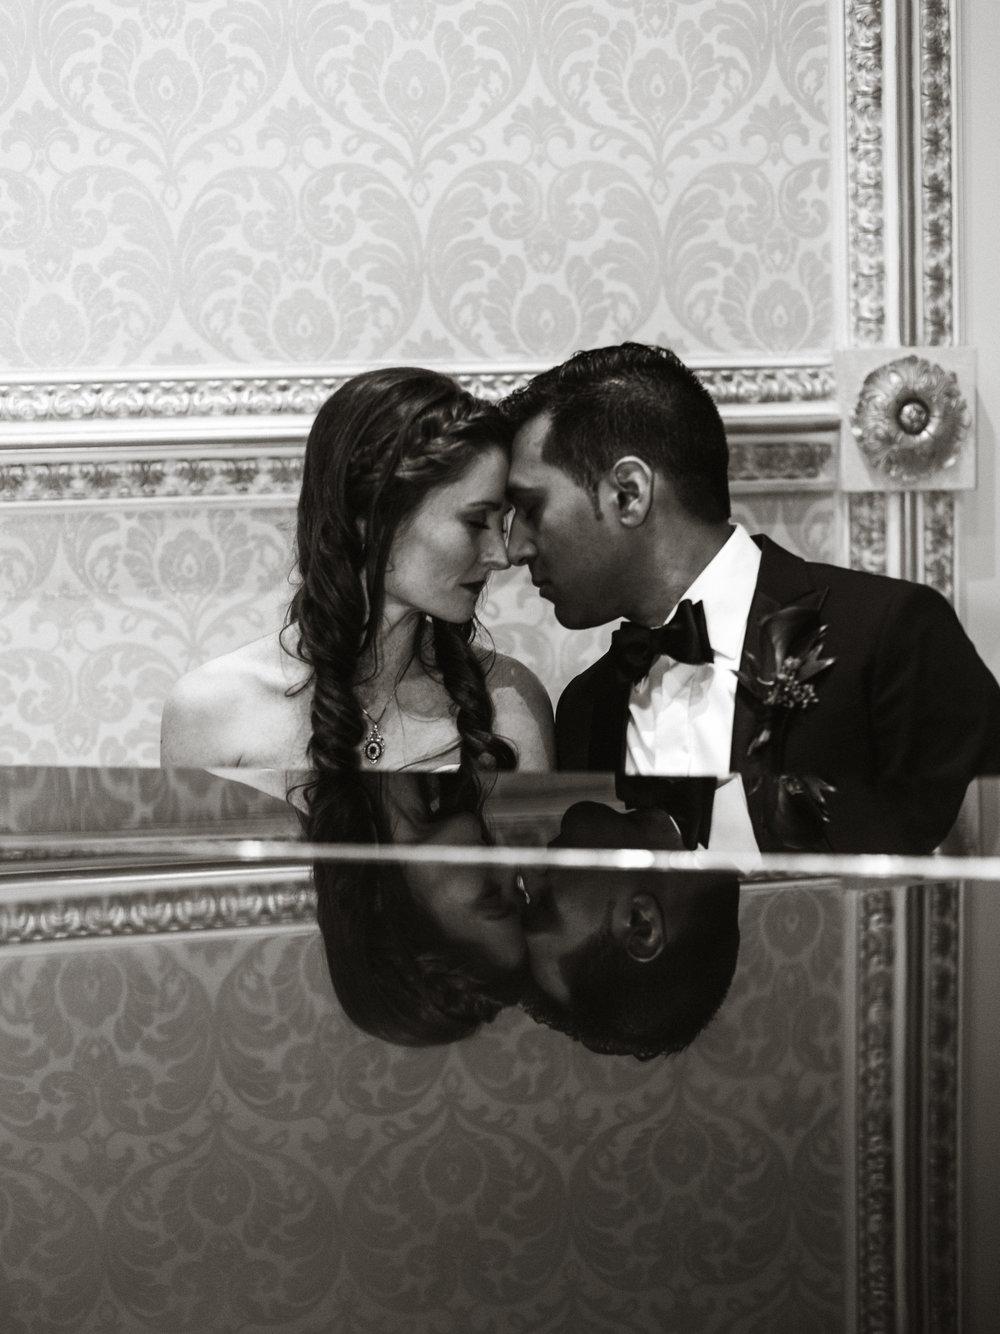 Reflection of couple sitting at a piano at a toronto wedding